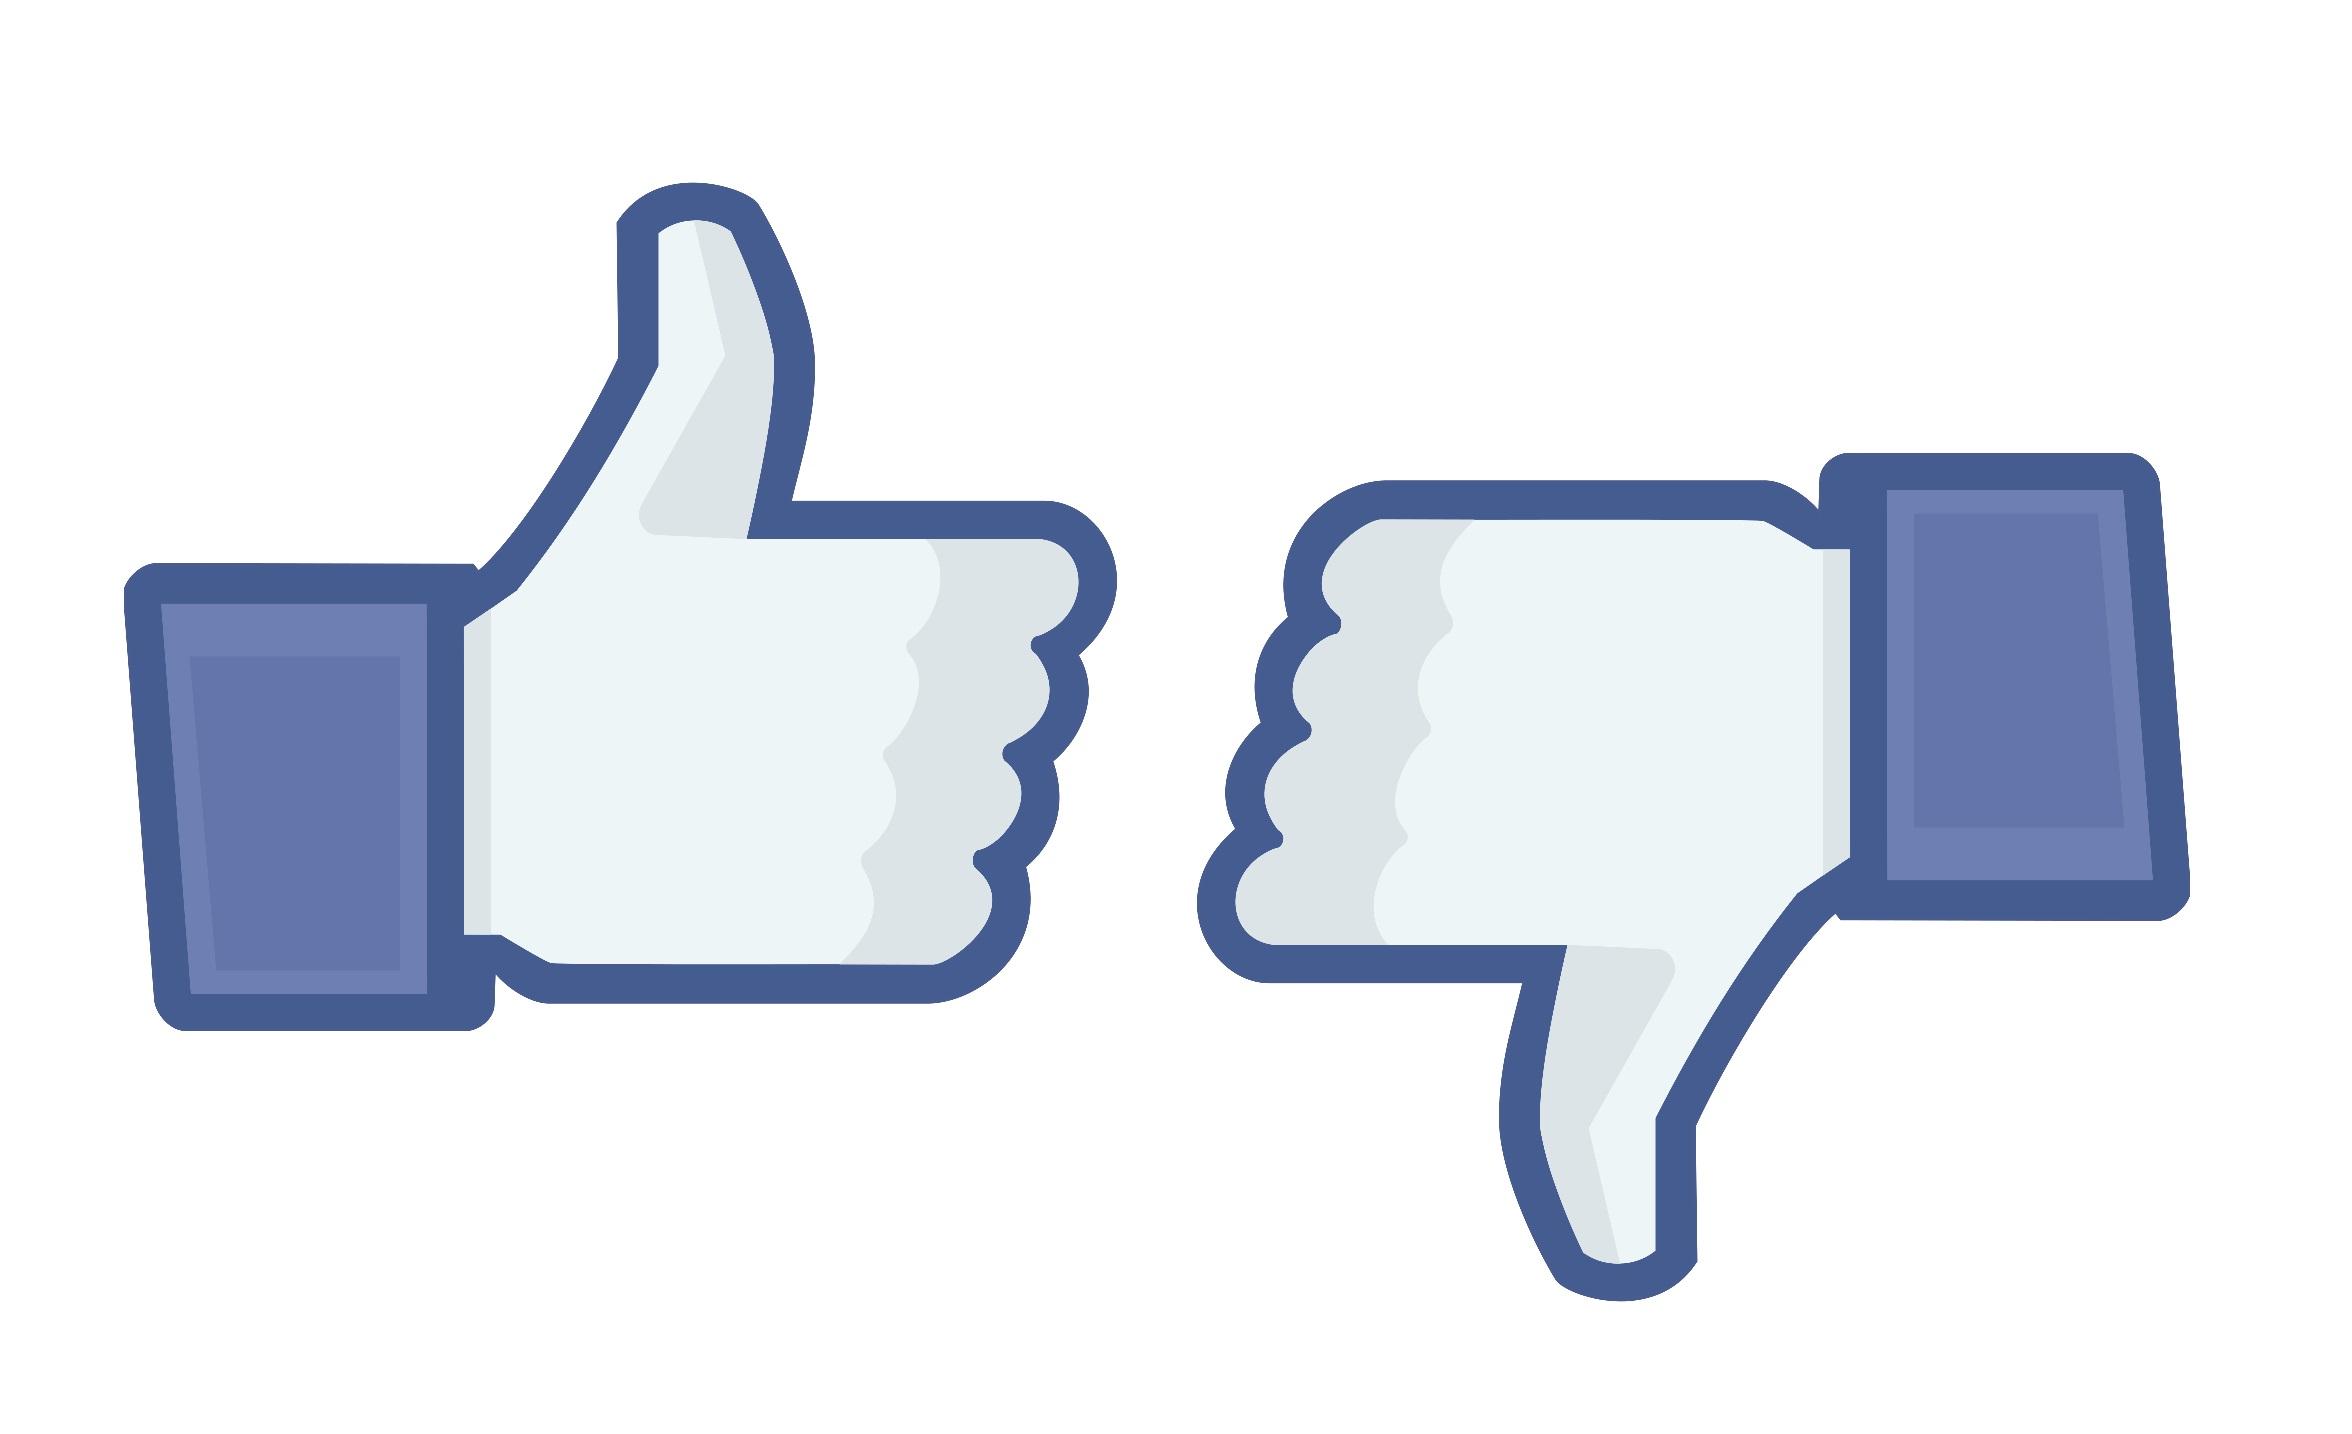 Facebook Finally Add A Dislike Feature